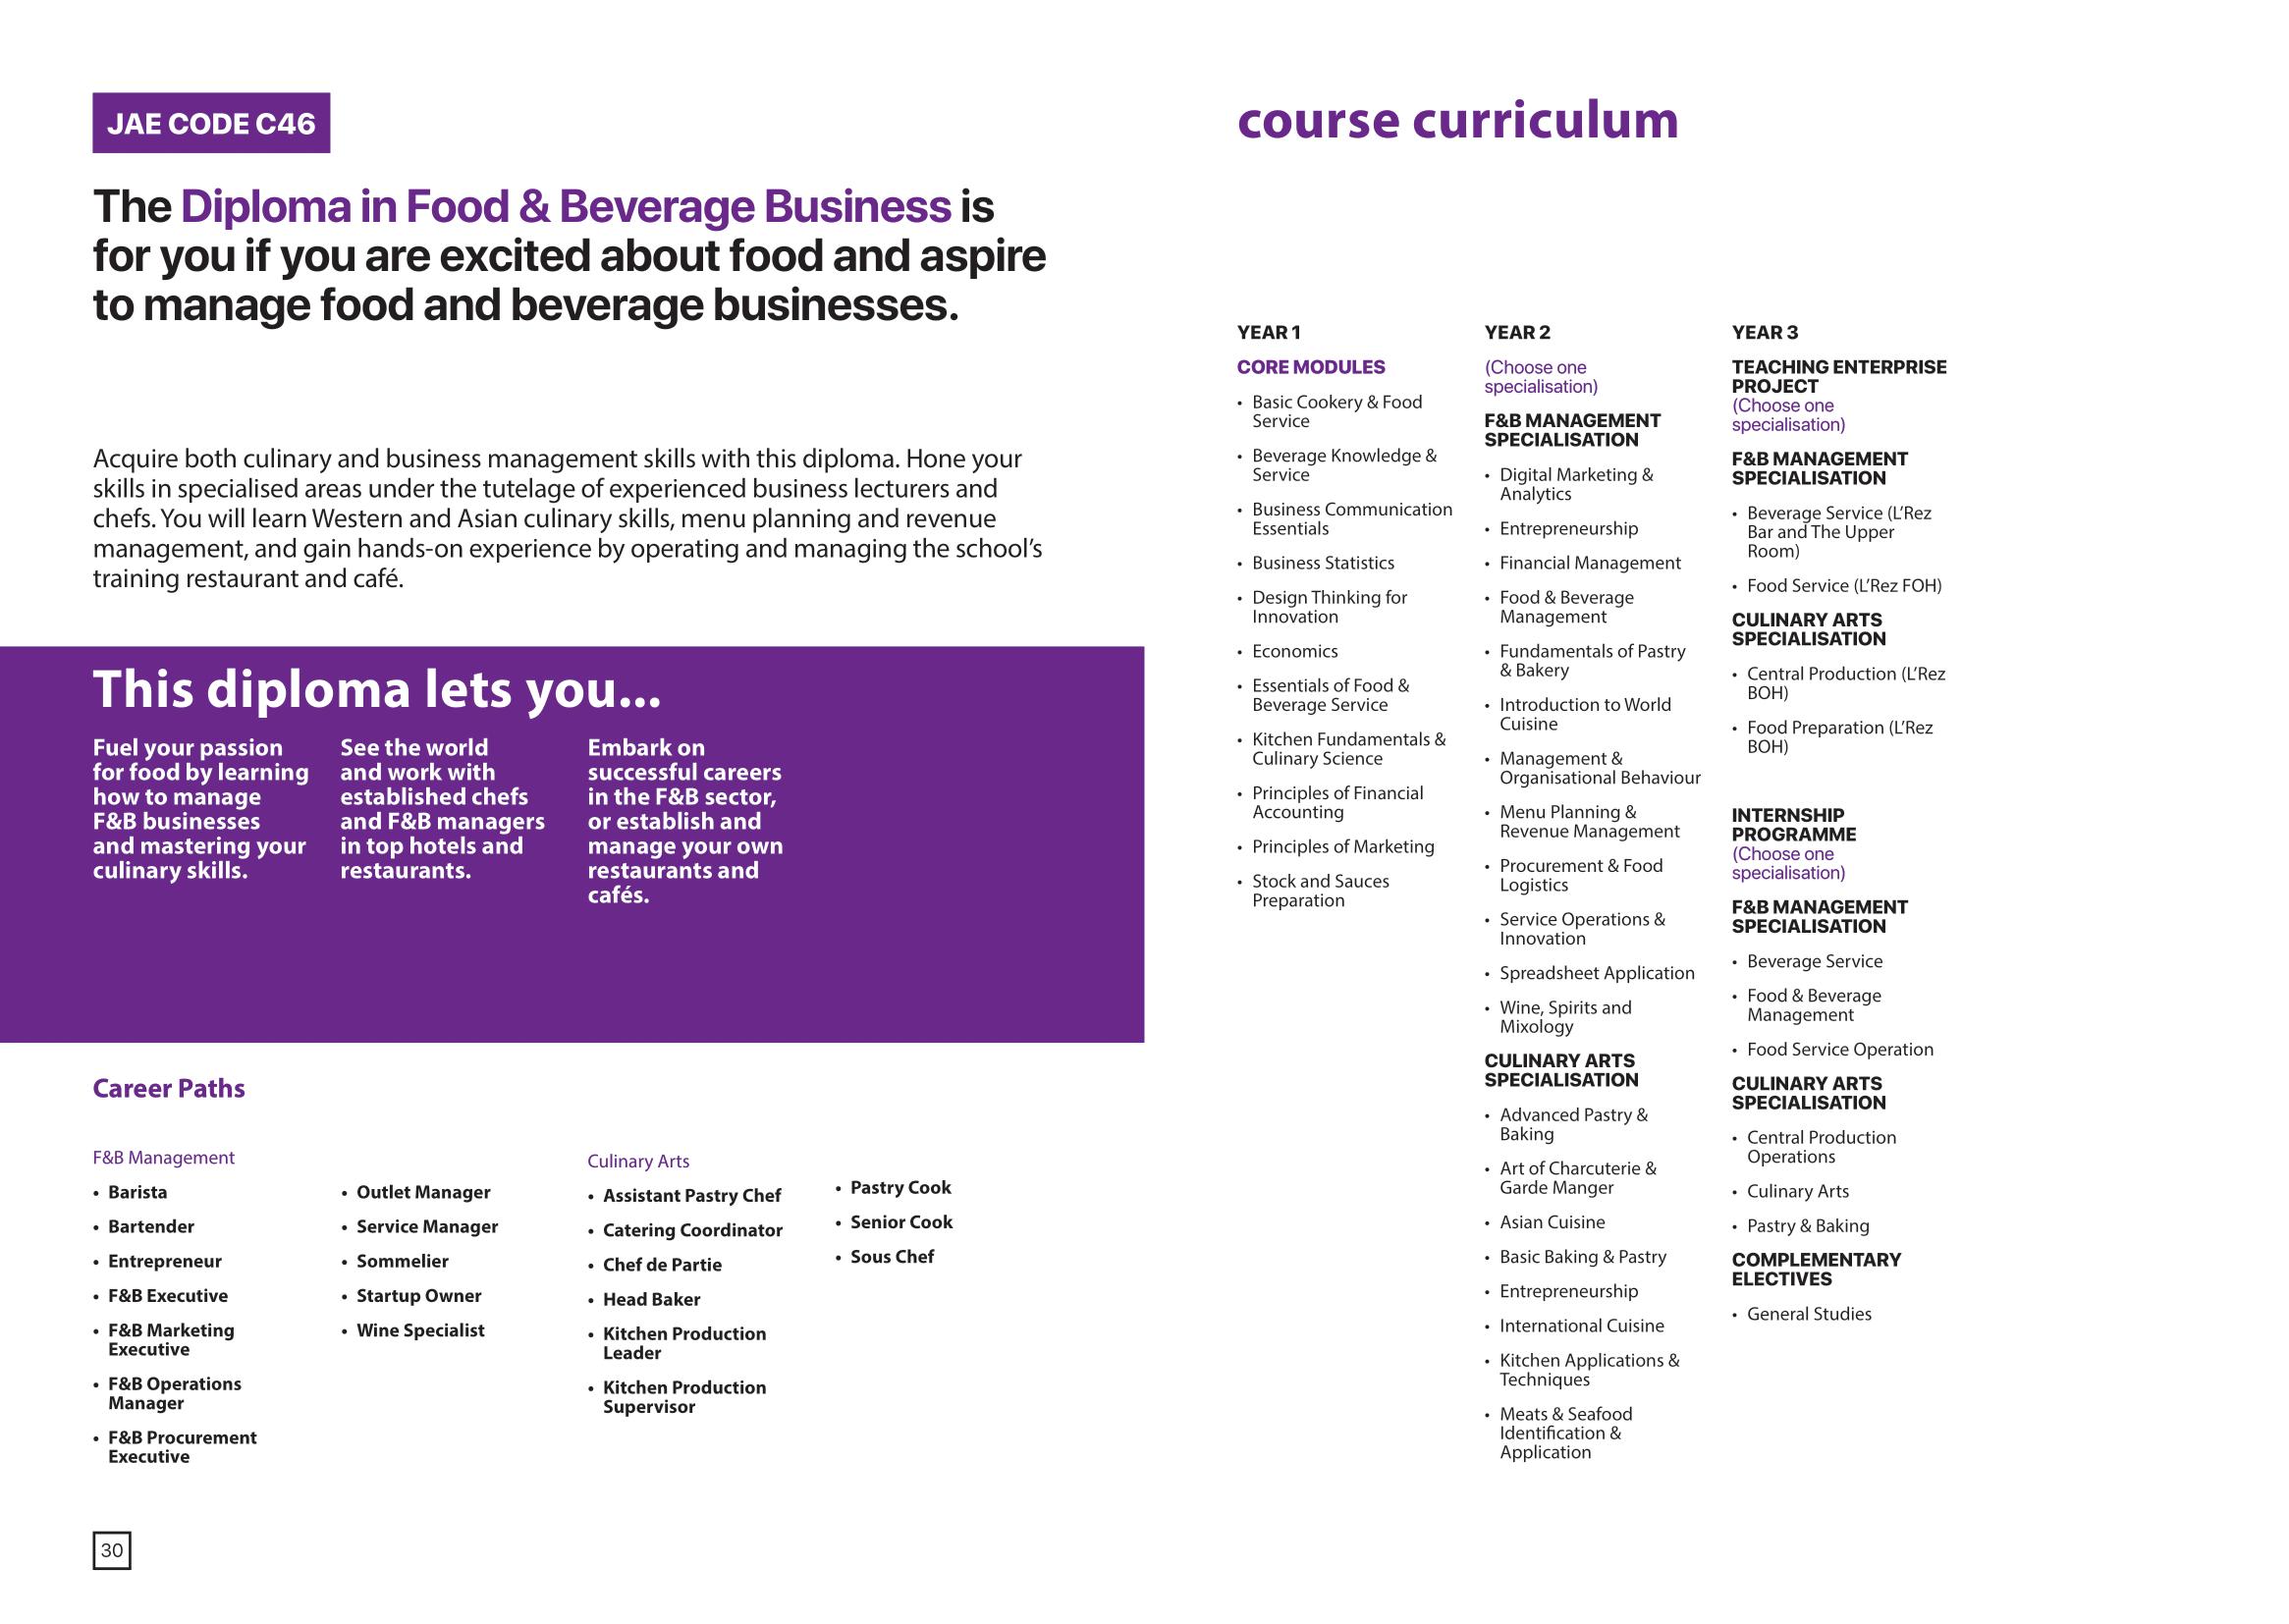 School of Business Management 2020-17